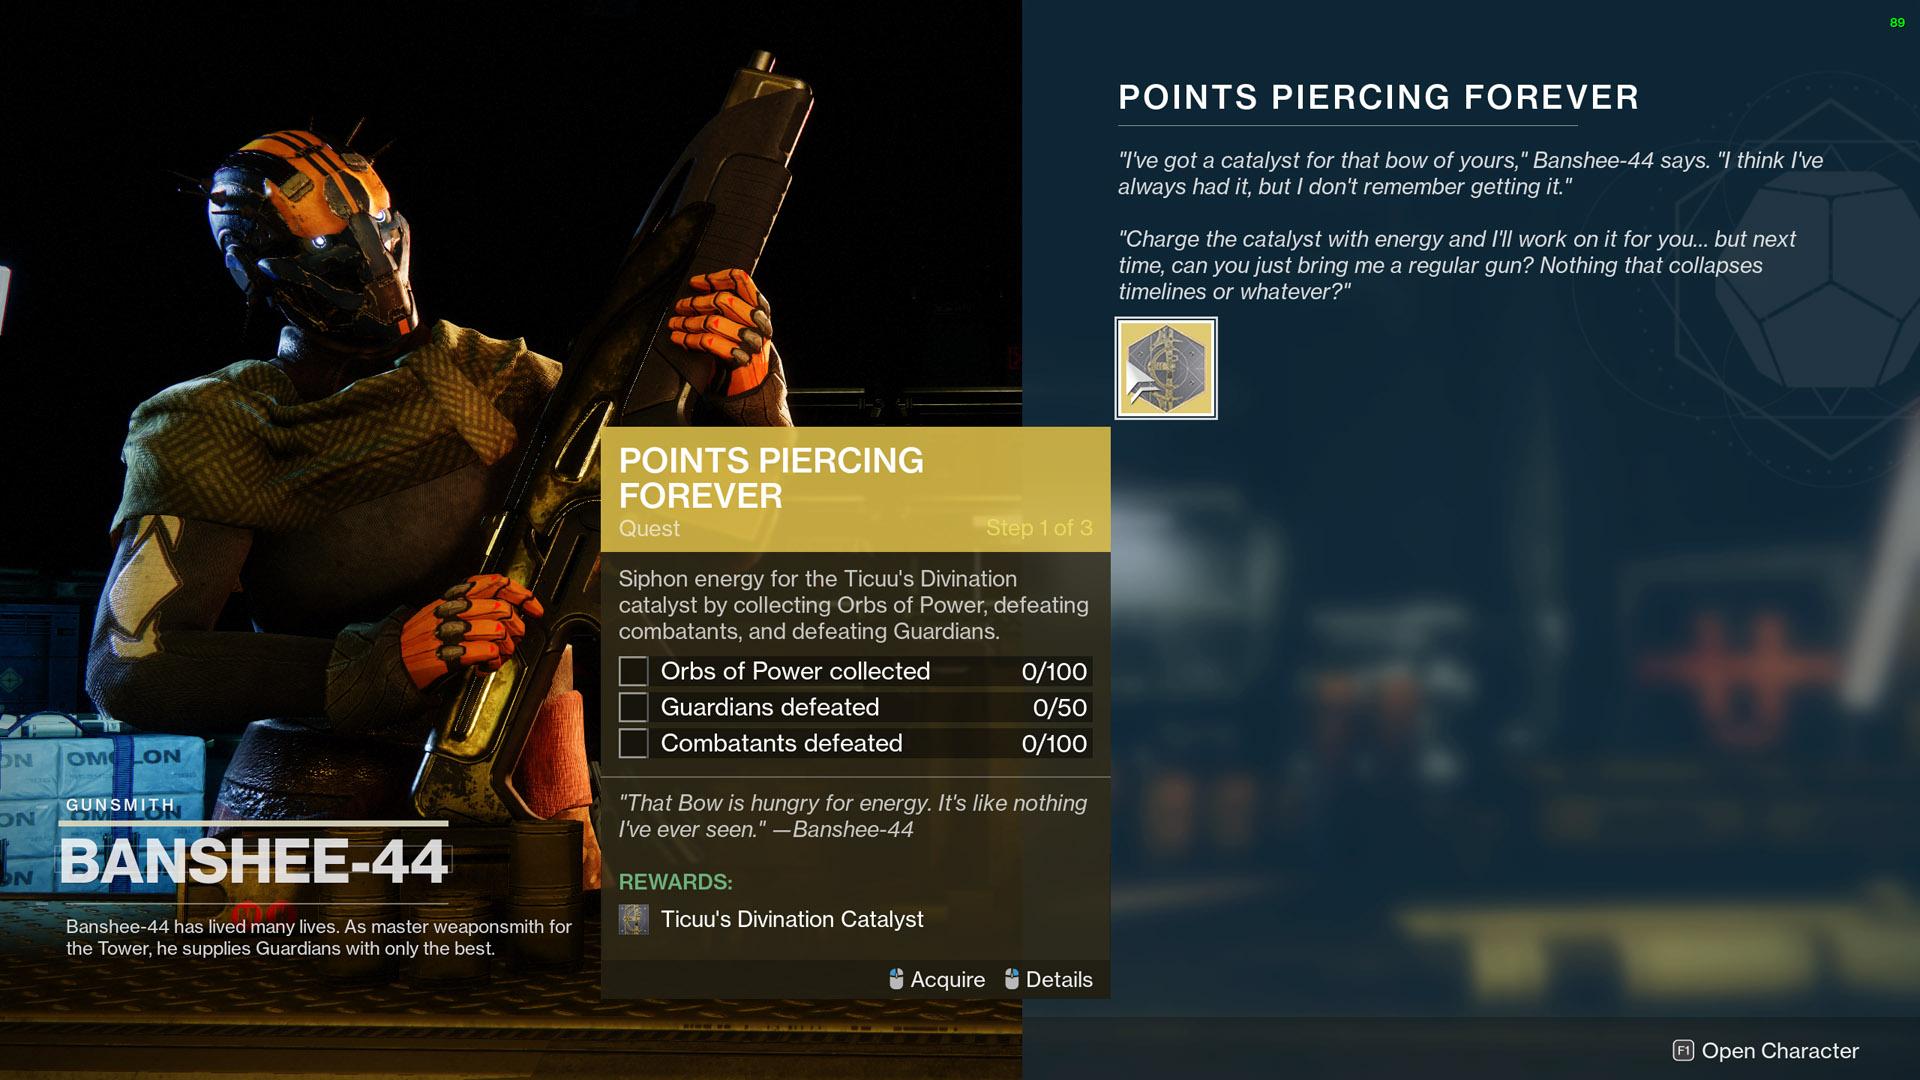 destiny 2 points piercing forever ticuus divination catalyst